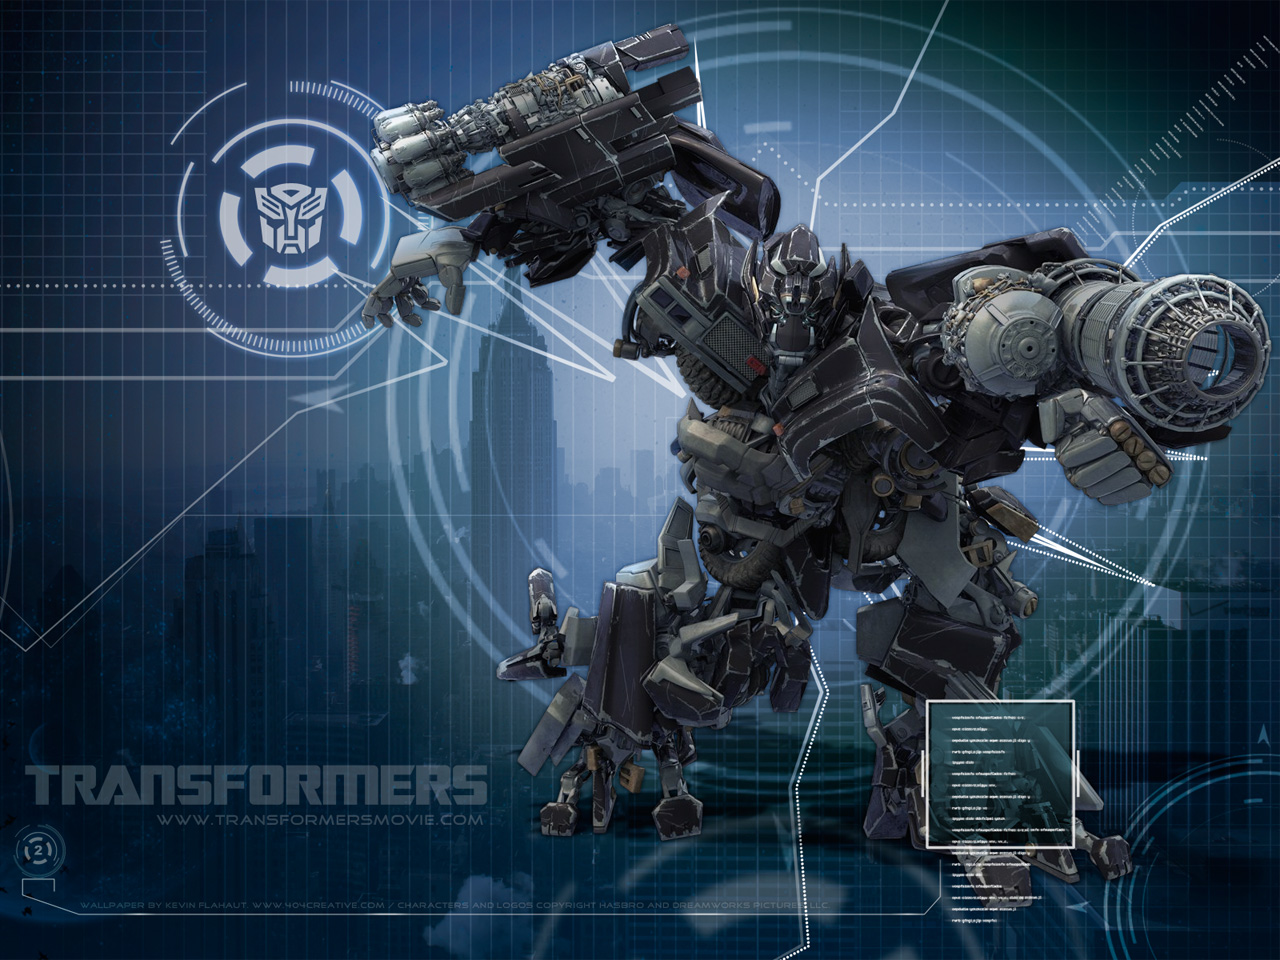 Transformers Transformers 1280x960